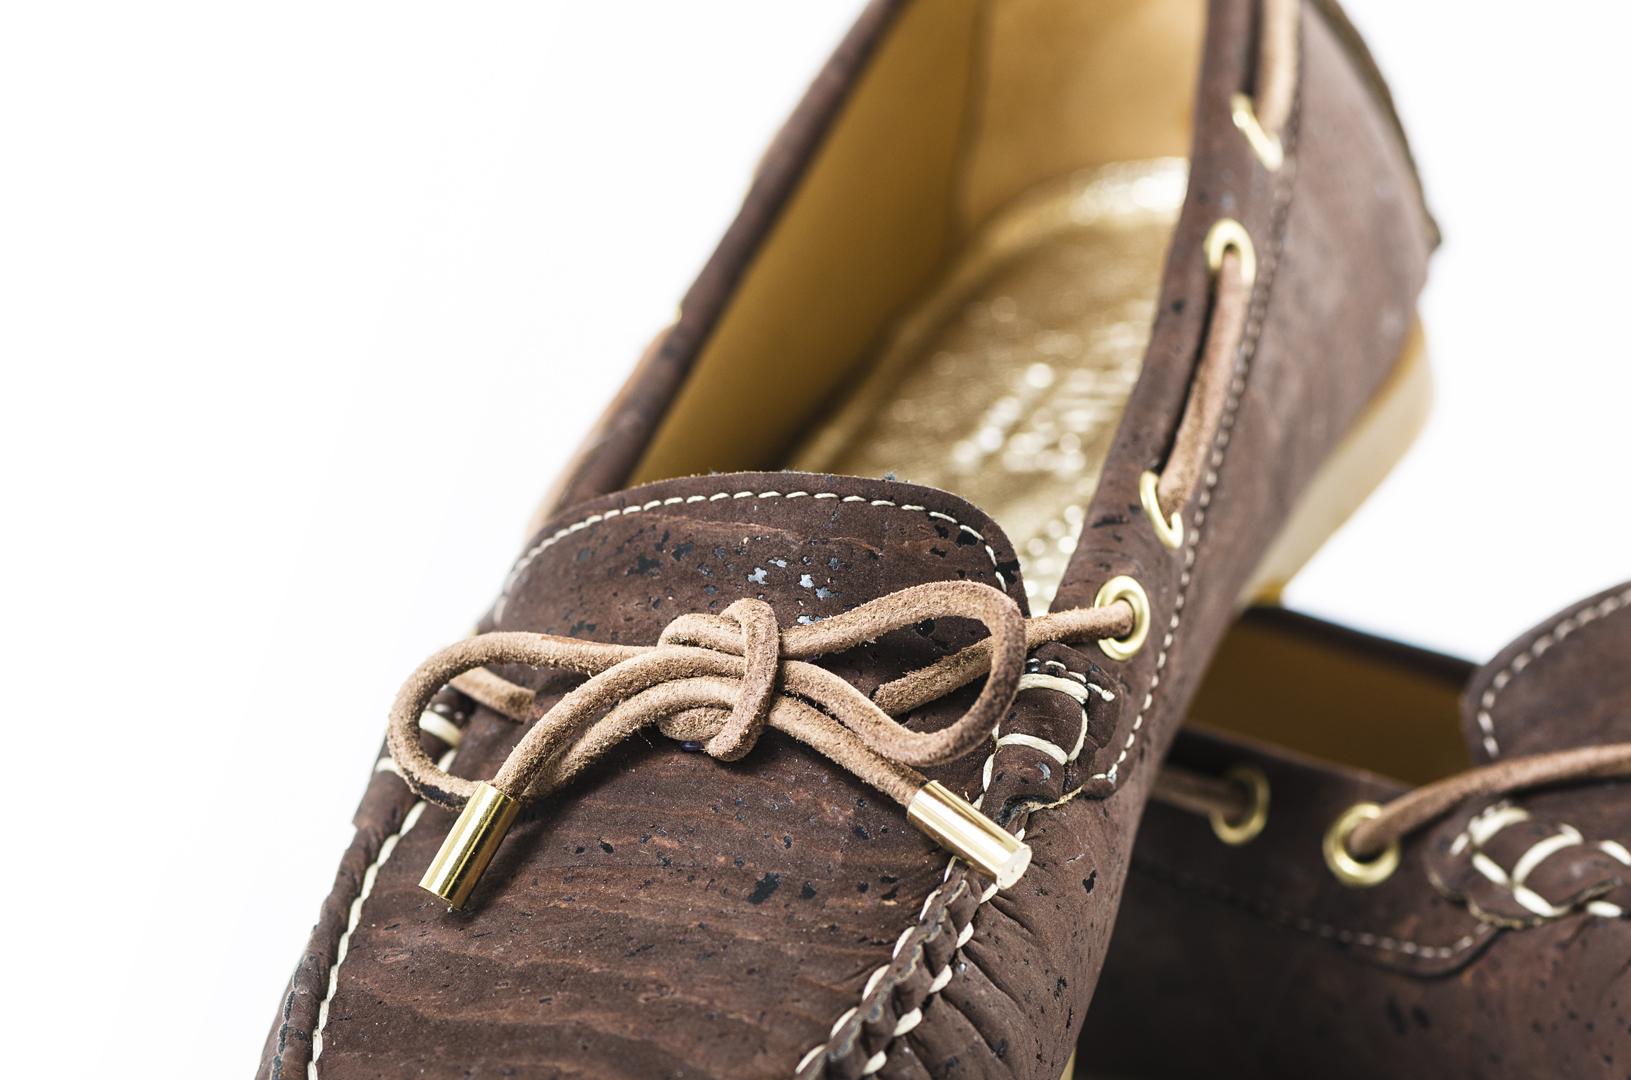 Schuhe, Kork, Korkschuhe, Espadrillas, Indiana Laced, Brown, editorial